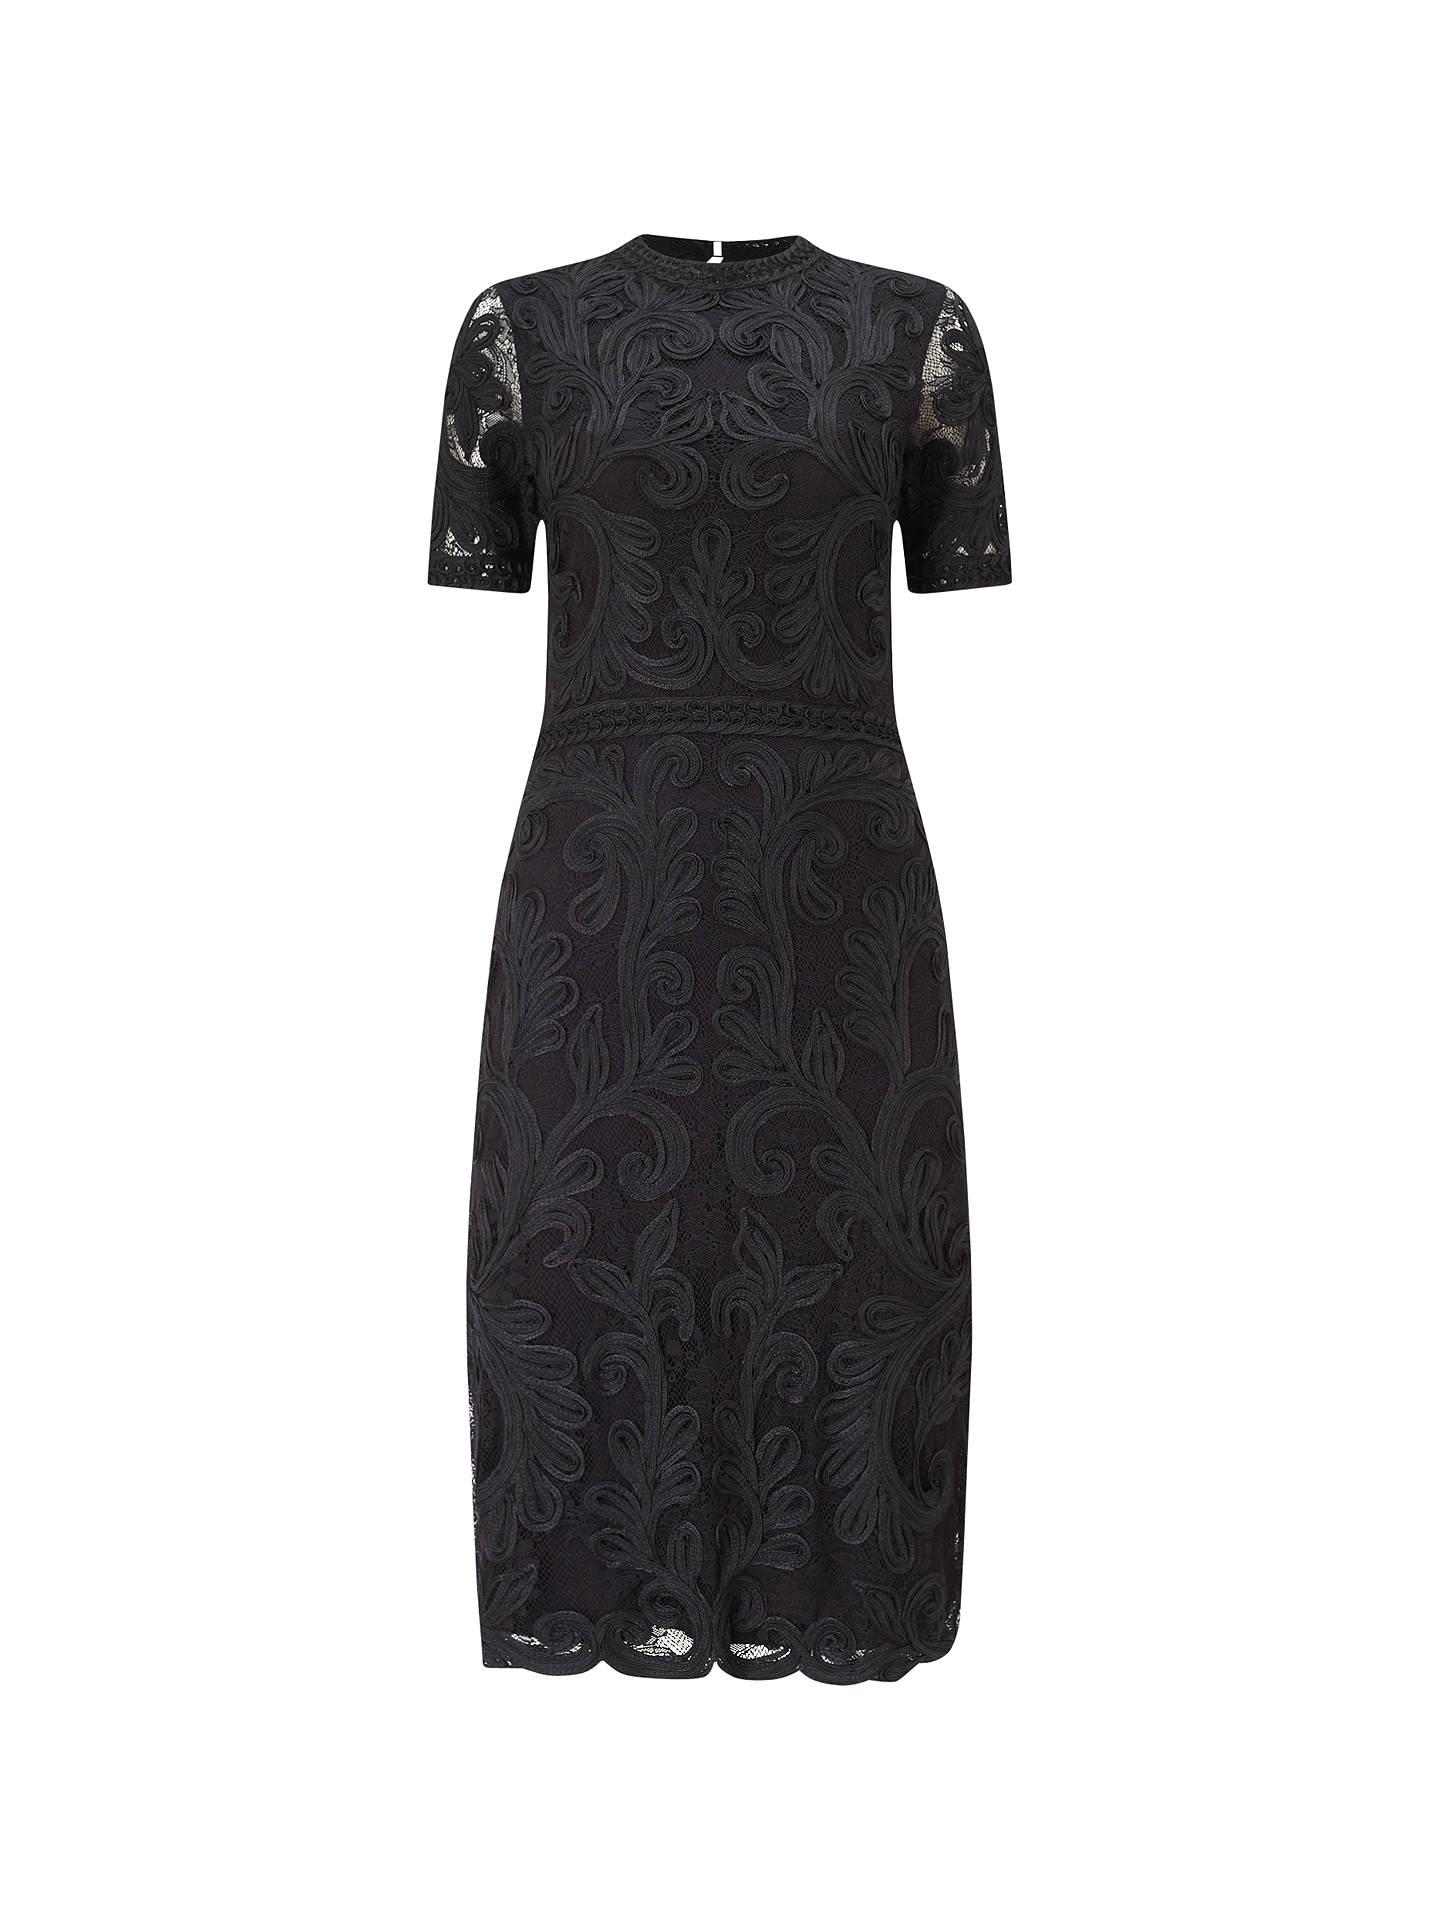 Phase Eight Allandra Tapework Dress, Black at John Lewis & Partners